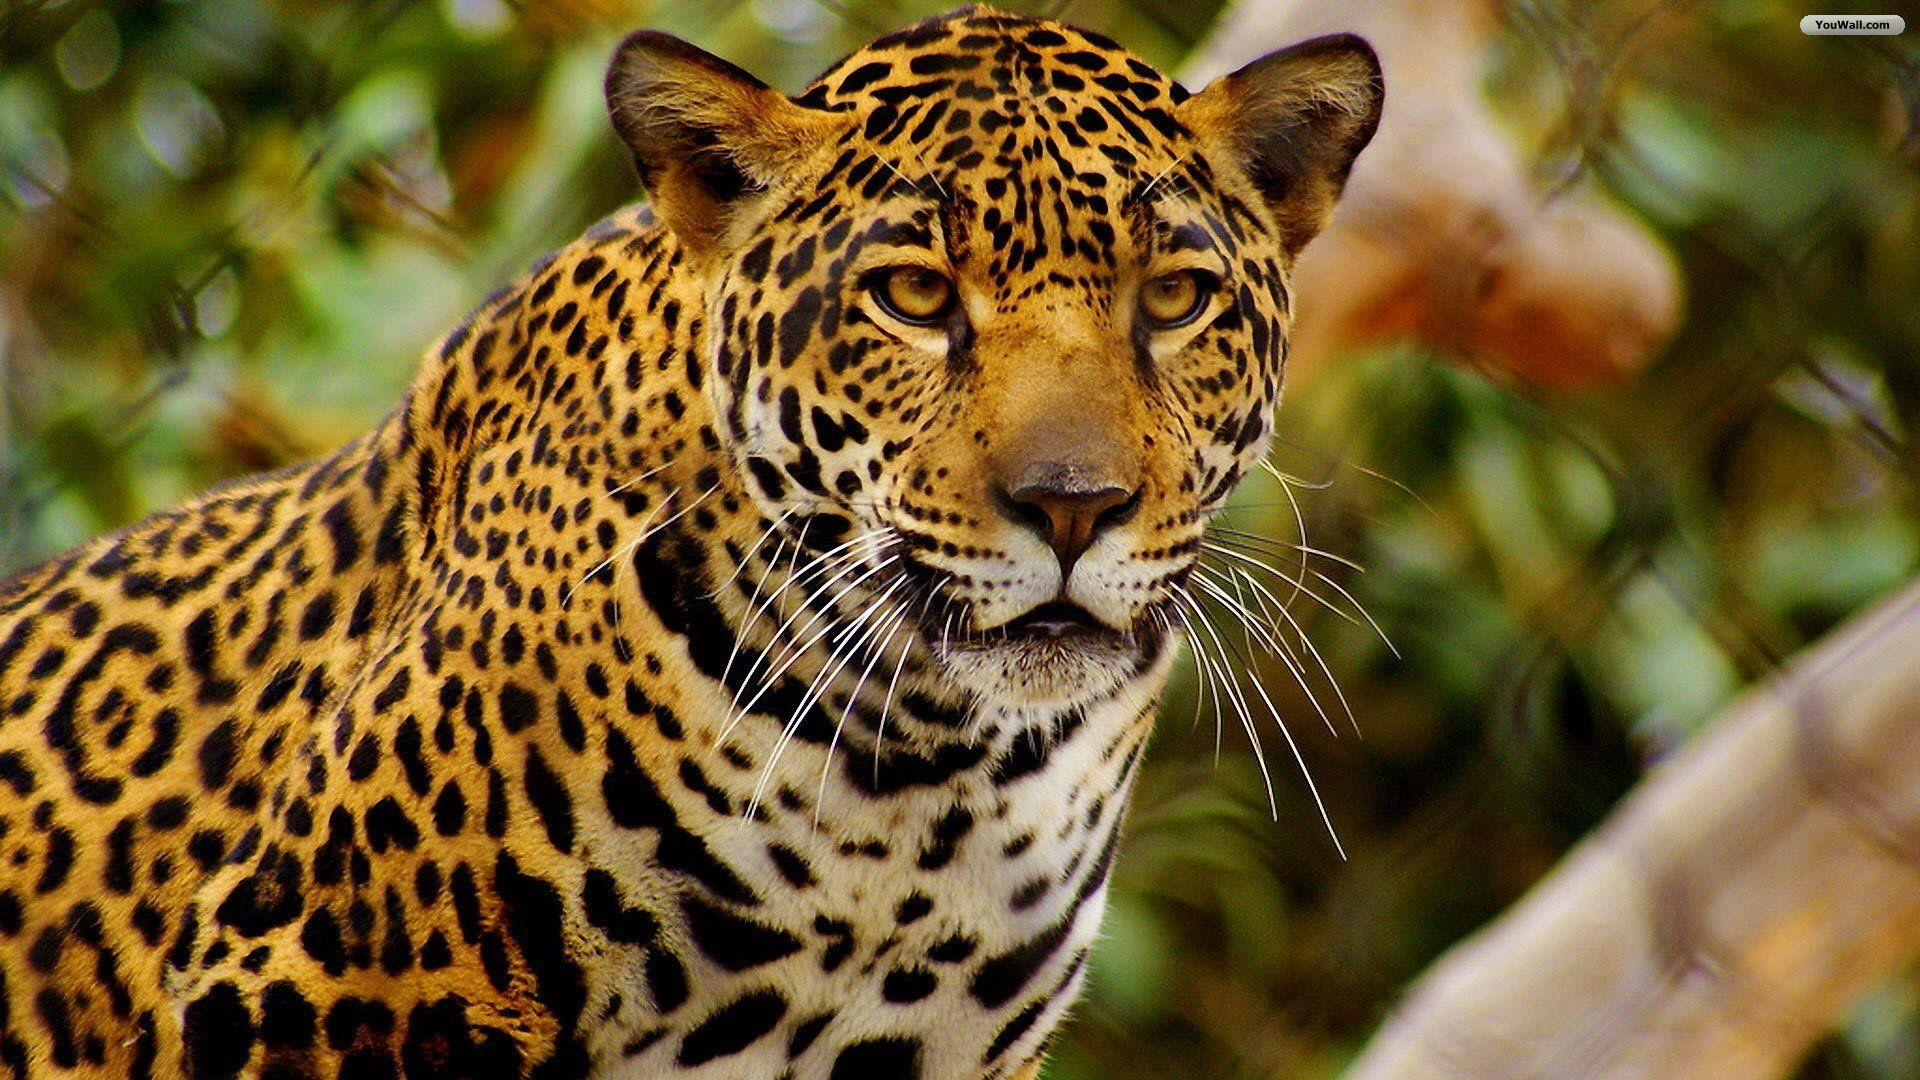 jaguar | my passions (animals, photography, nature, places